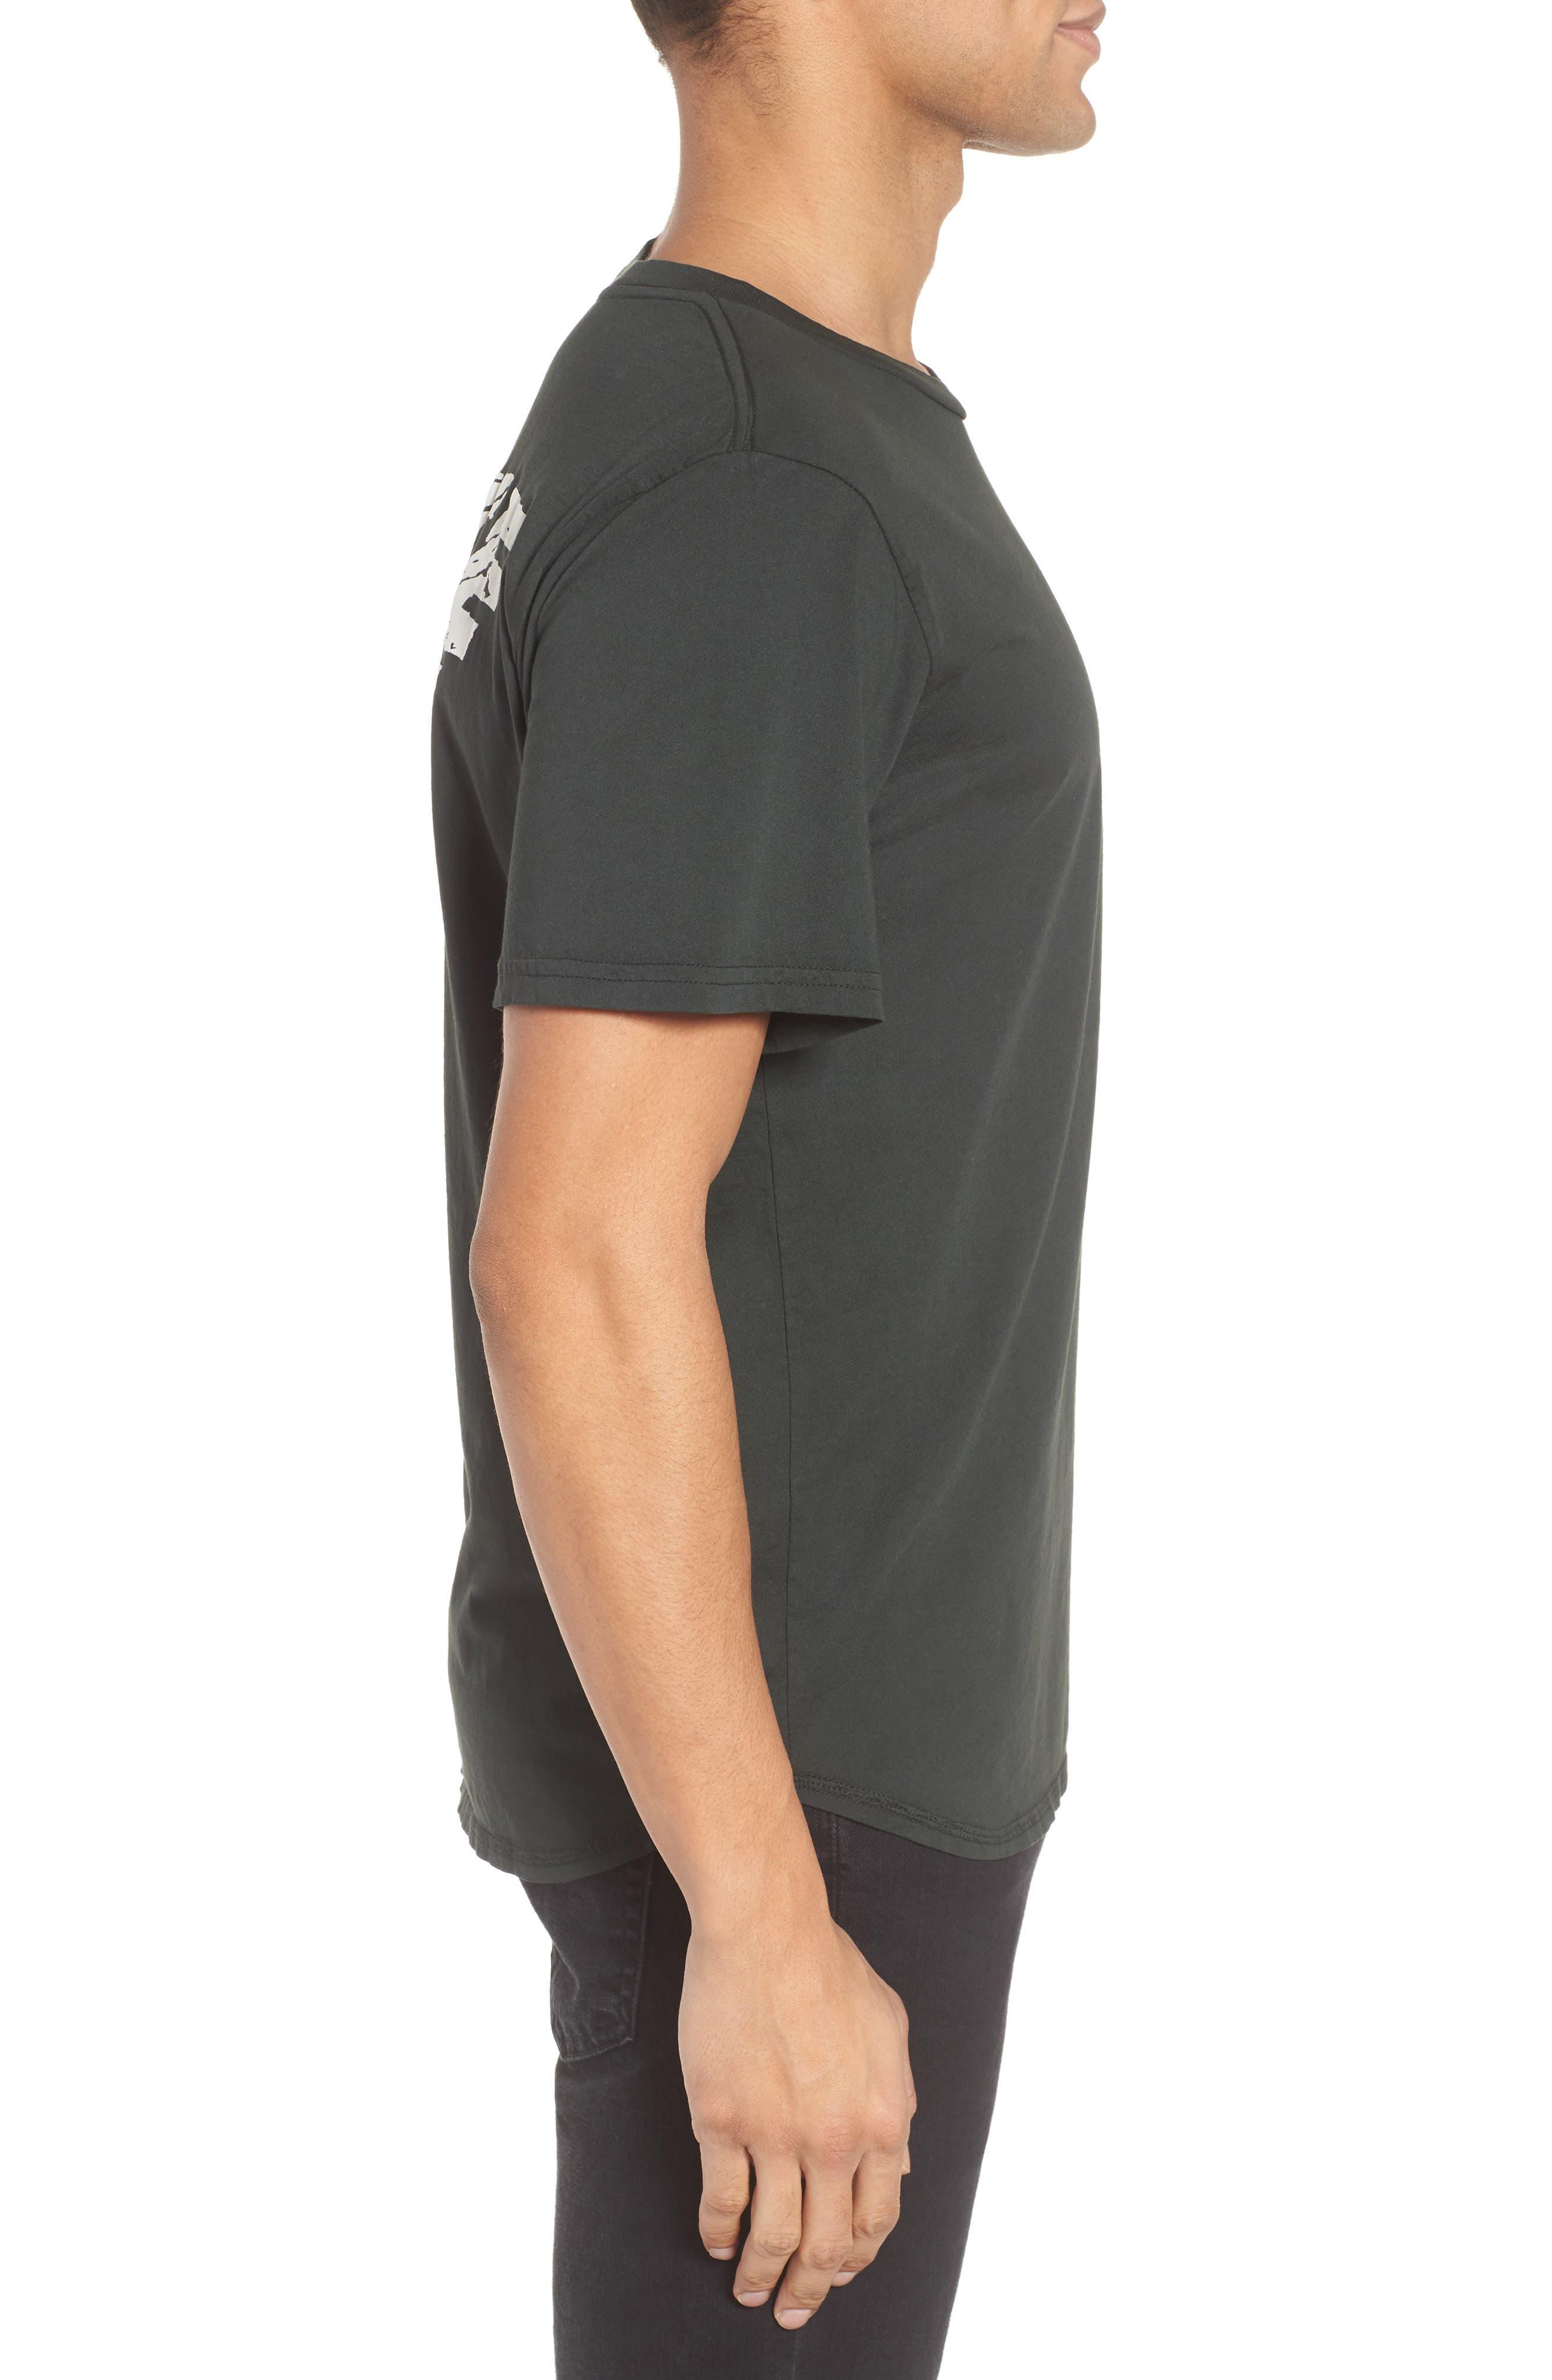 White Riot Graphic T-Shirt,                             Alternate thumbnail 3, color,                             Dusty Black